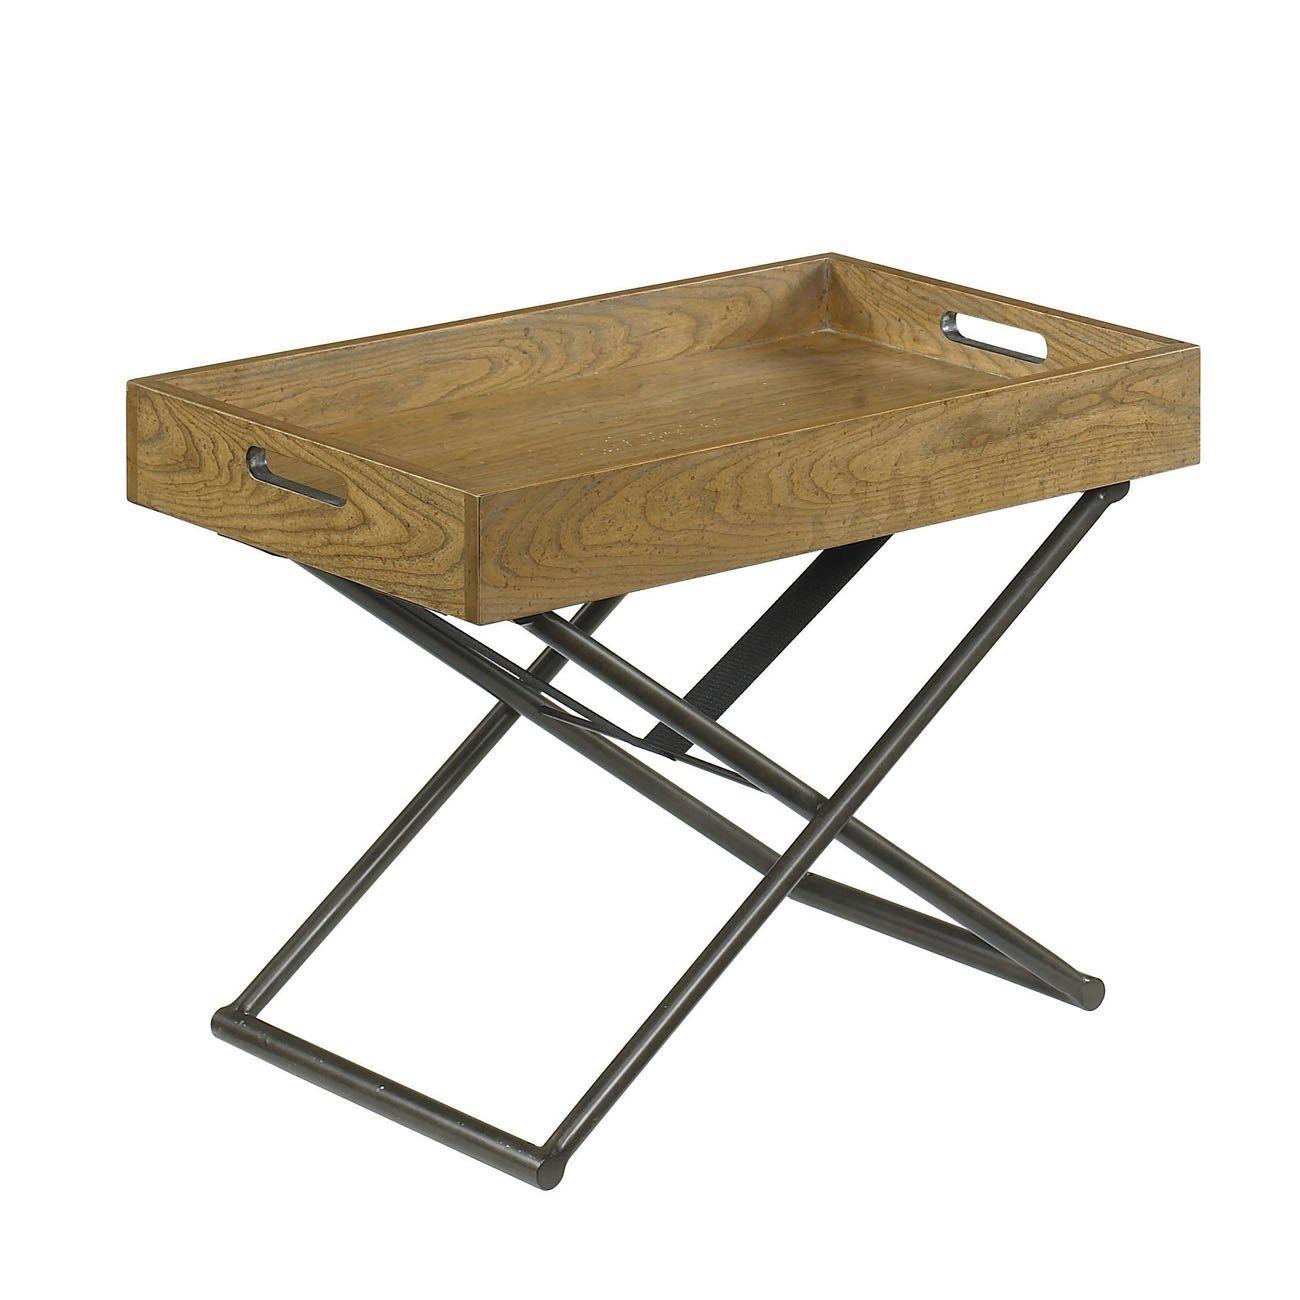 Hammary 090 317 Hidden Treasures Adjustable Tray Table